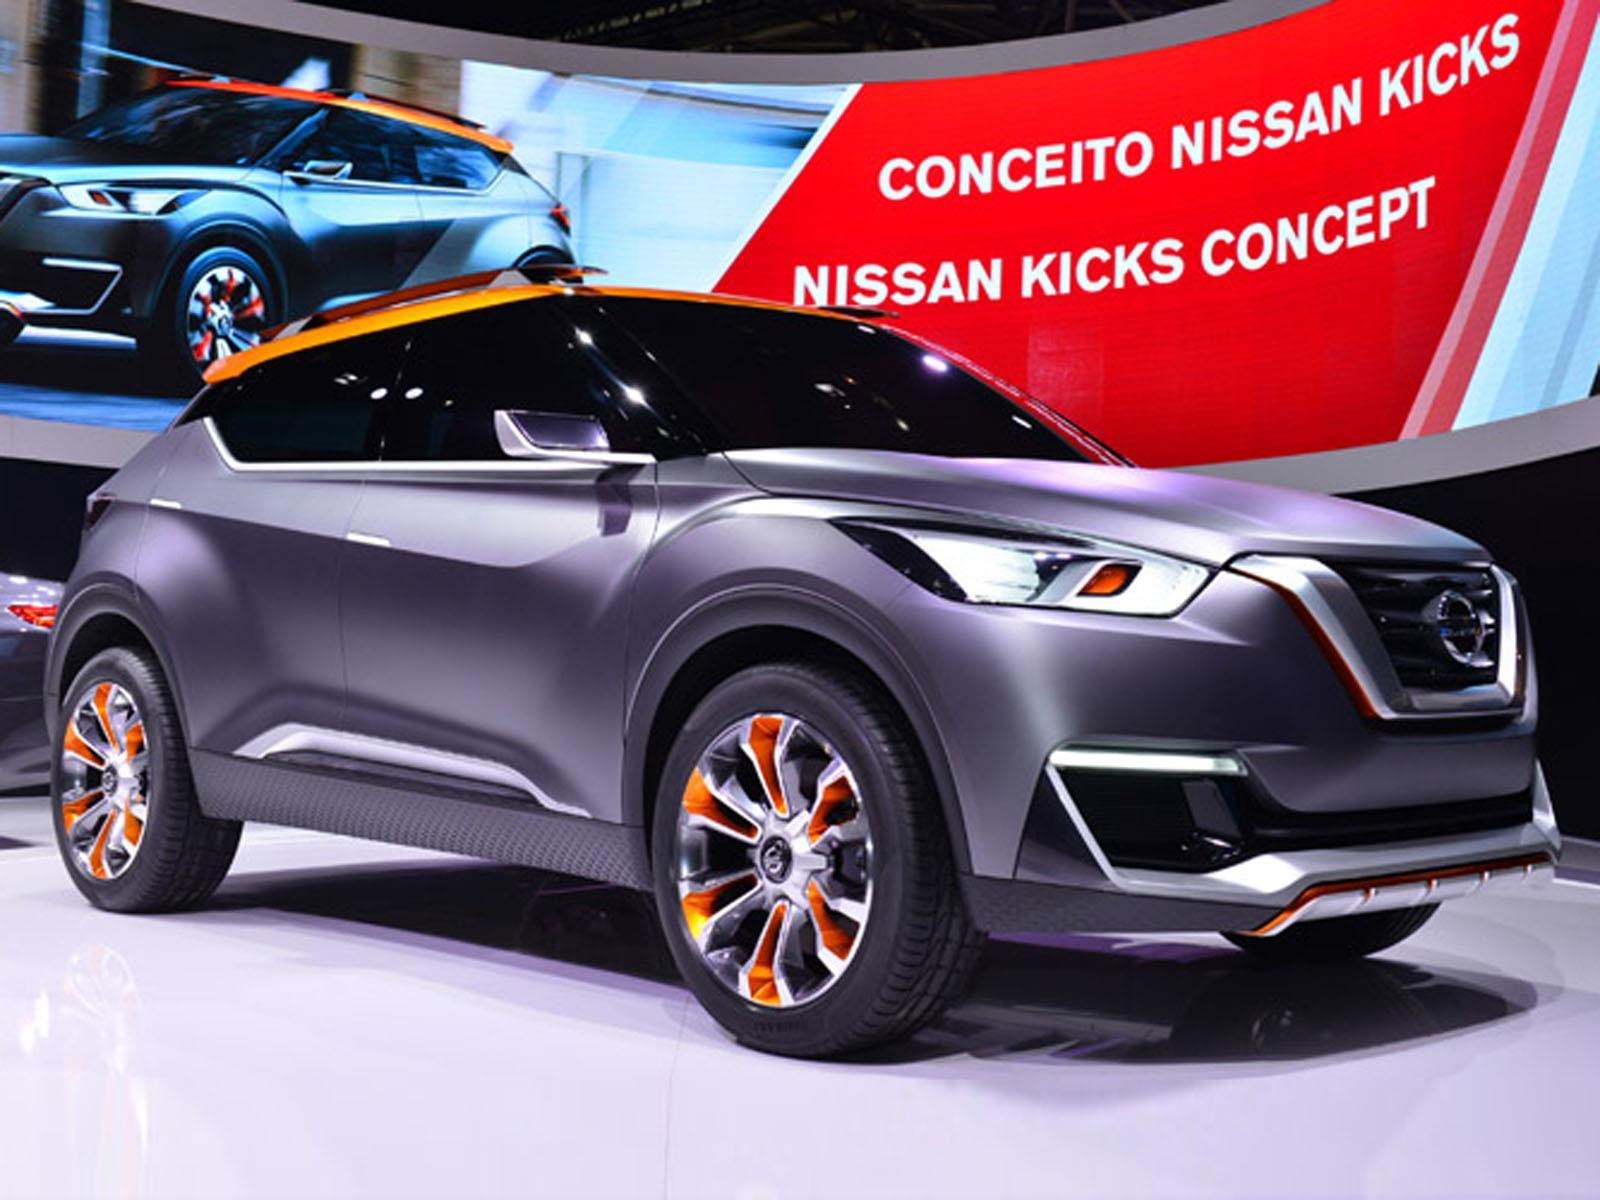 Salón de San Pablo 2014 - Nissan Kicks Concept, patea el tablero